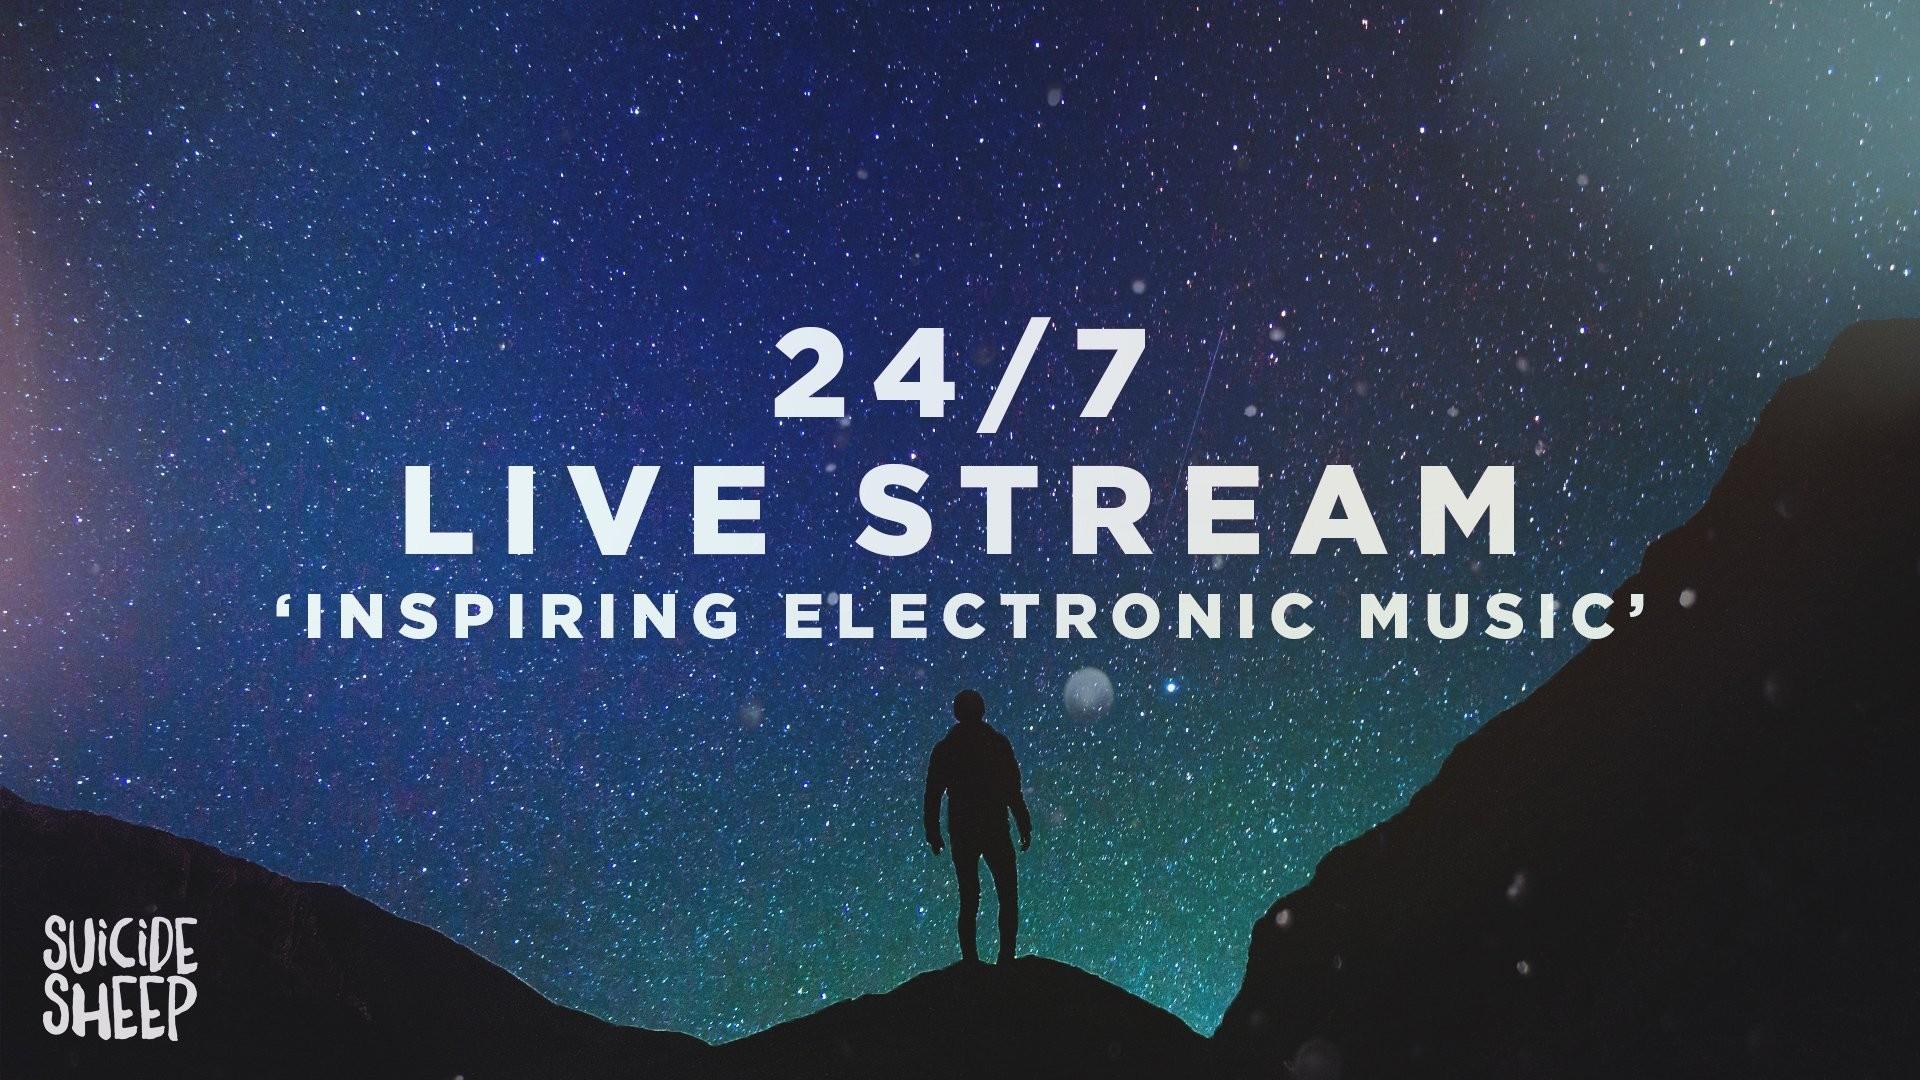 "MrSuicideSheep on Twitter: ""The 24/7 live stream of inspiring Electronic  music has started! https://t.co/qKvij57B67 https://t.co/idF7HmfGyB"""